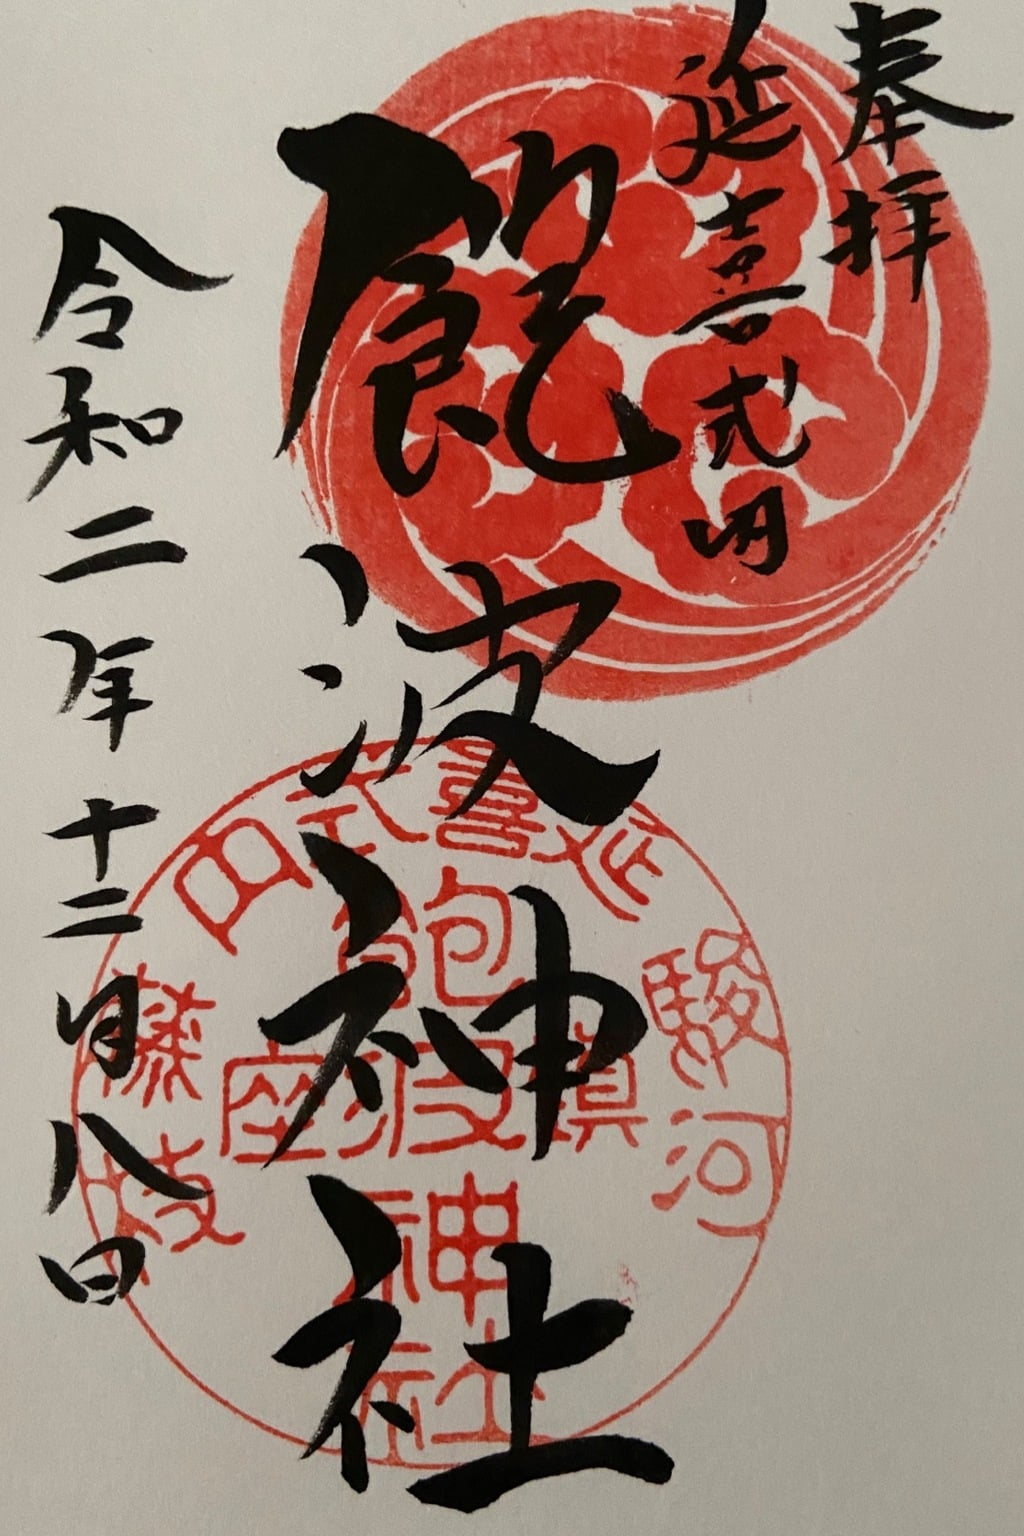 飽波神社の御朱印